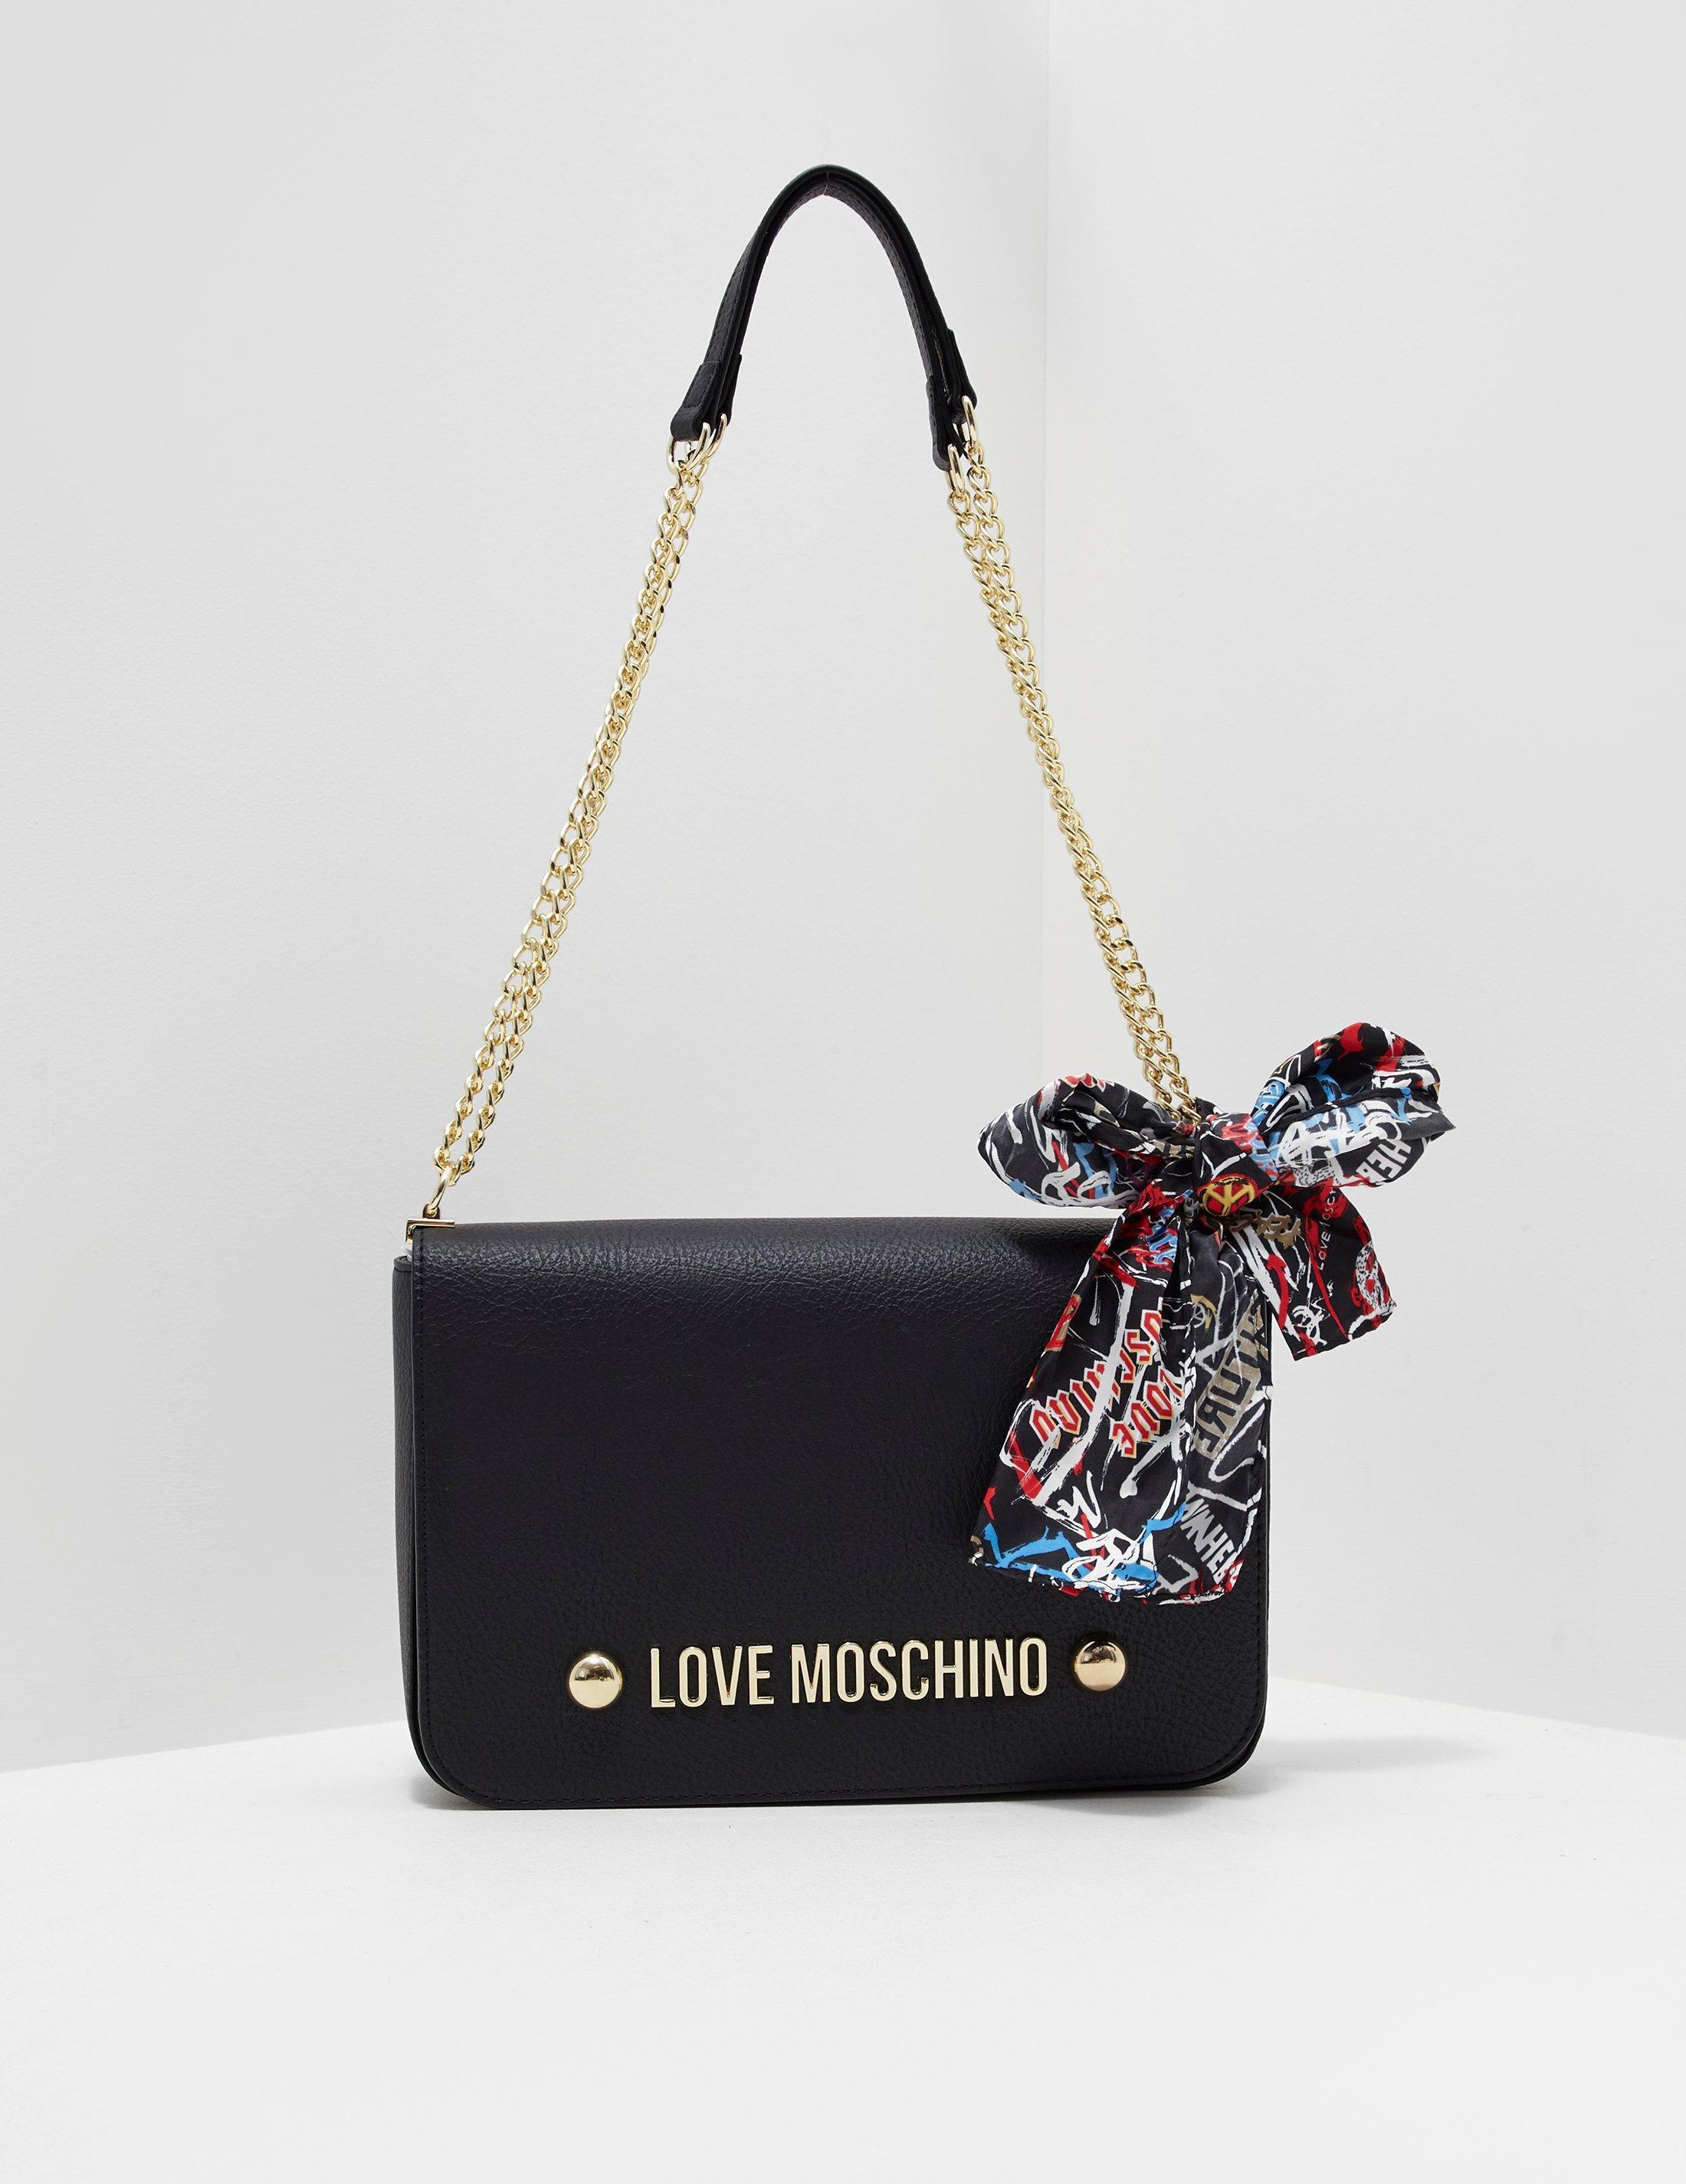 Love Moschino Womens Scarf Shoulder Bag Black in Black - Lyst 98f1c172bde